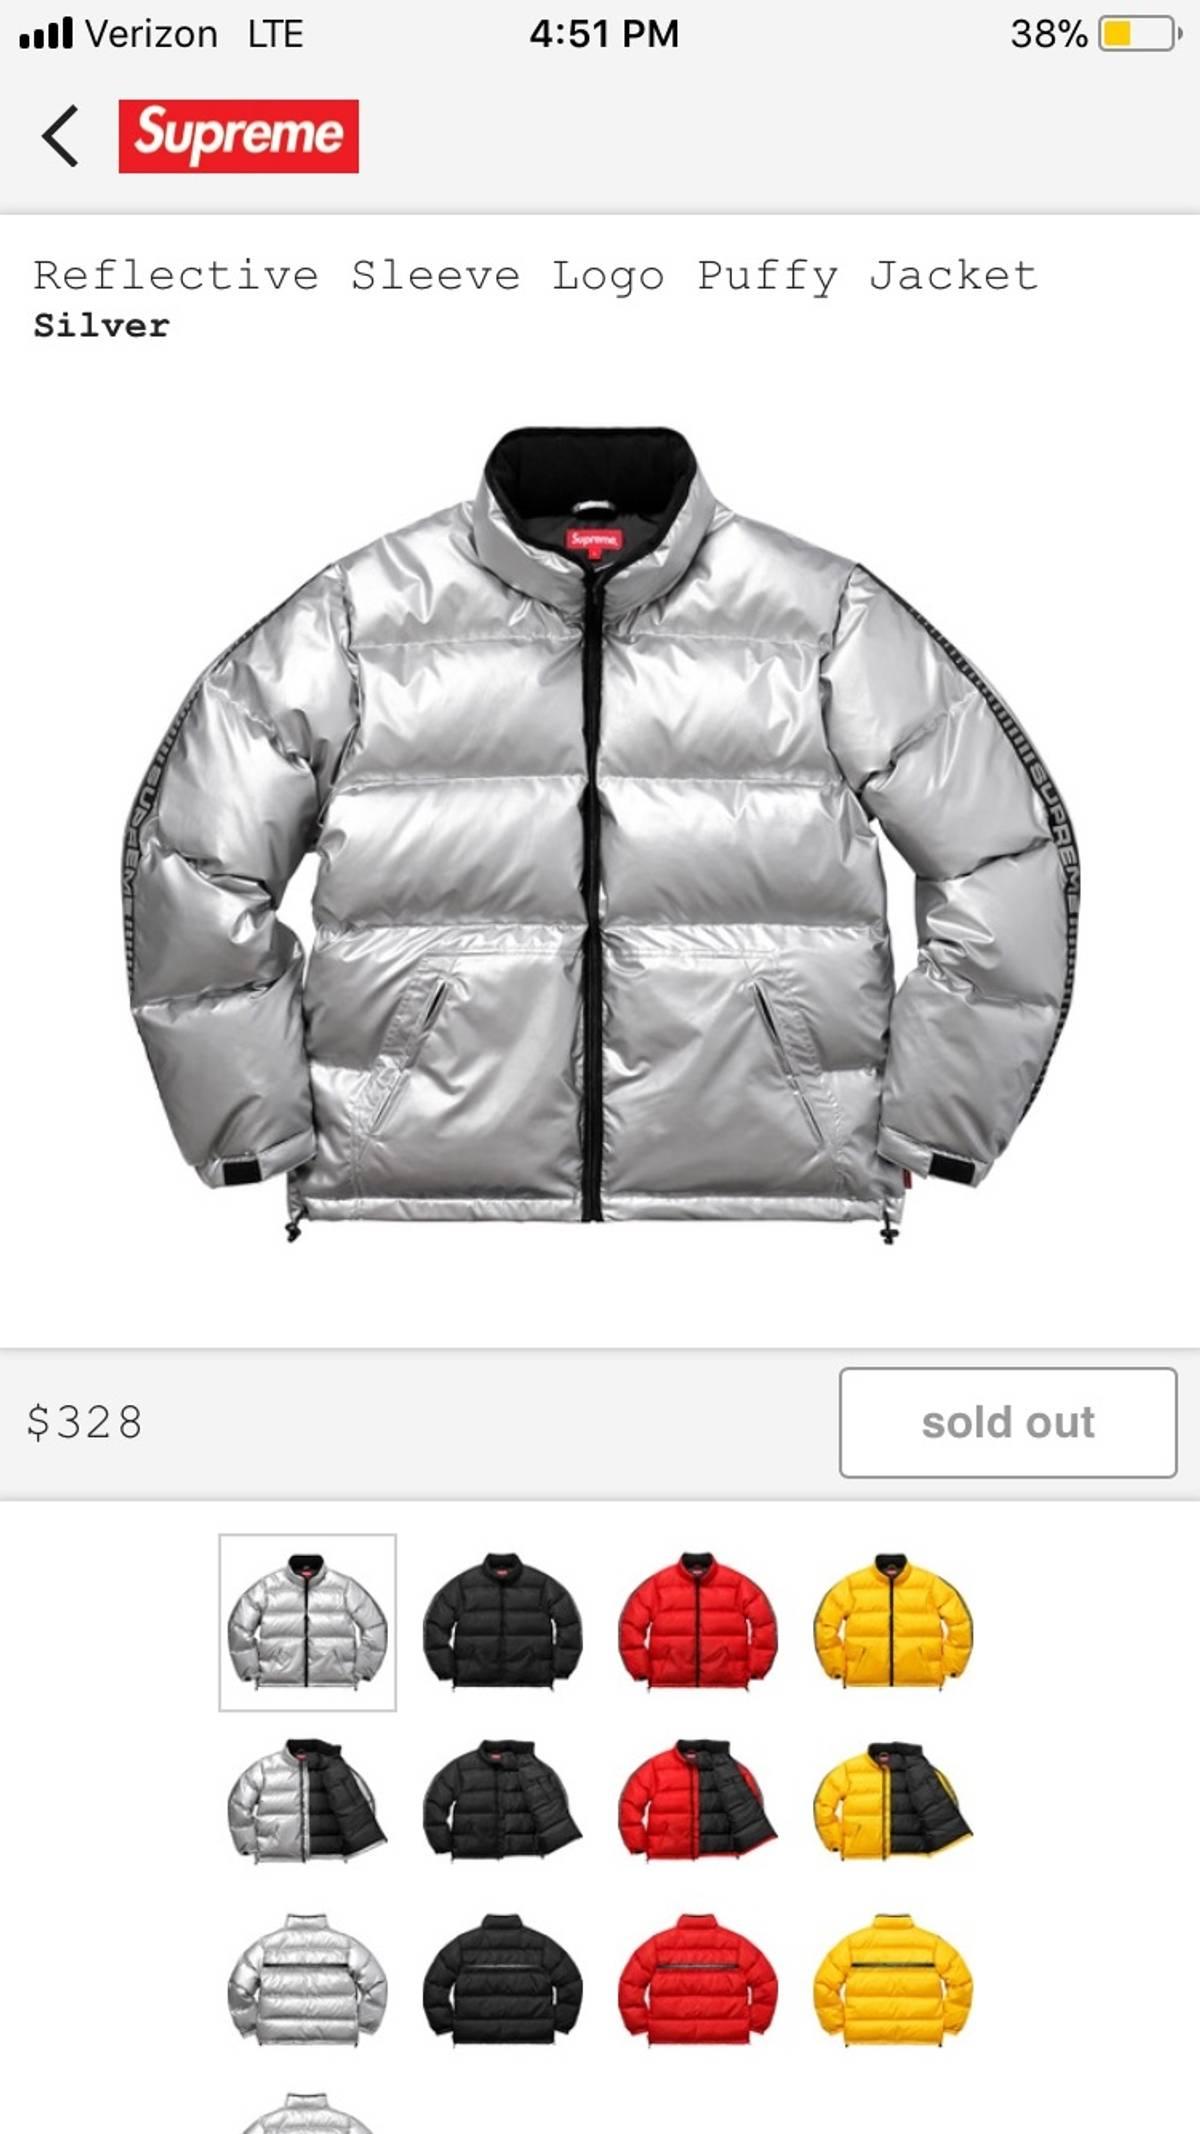 010ed766 Supreme Supreme Reflective Sleeve Logo Puffy Jacket | Grailed